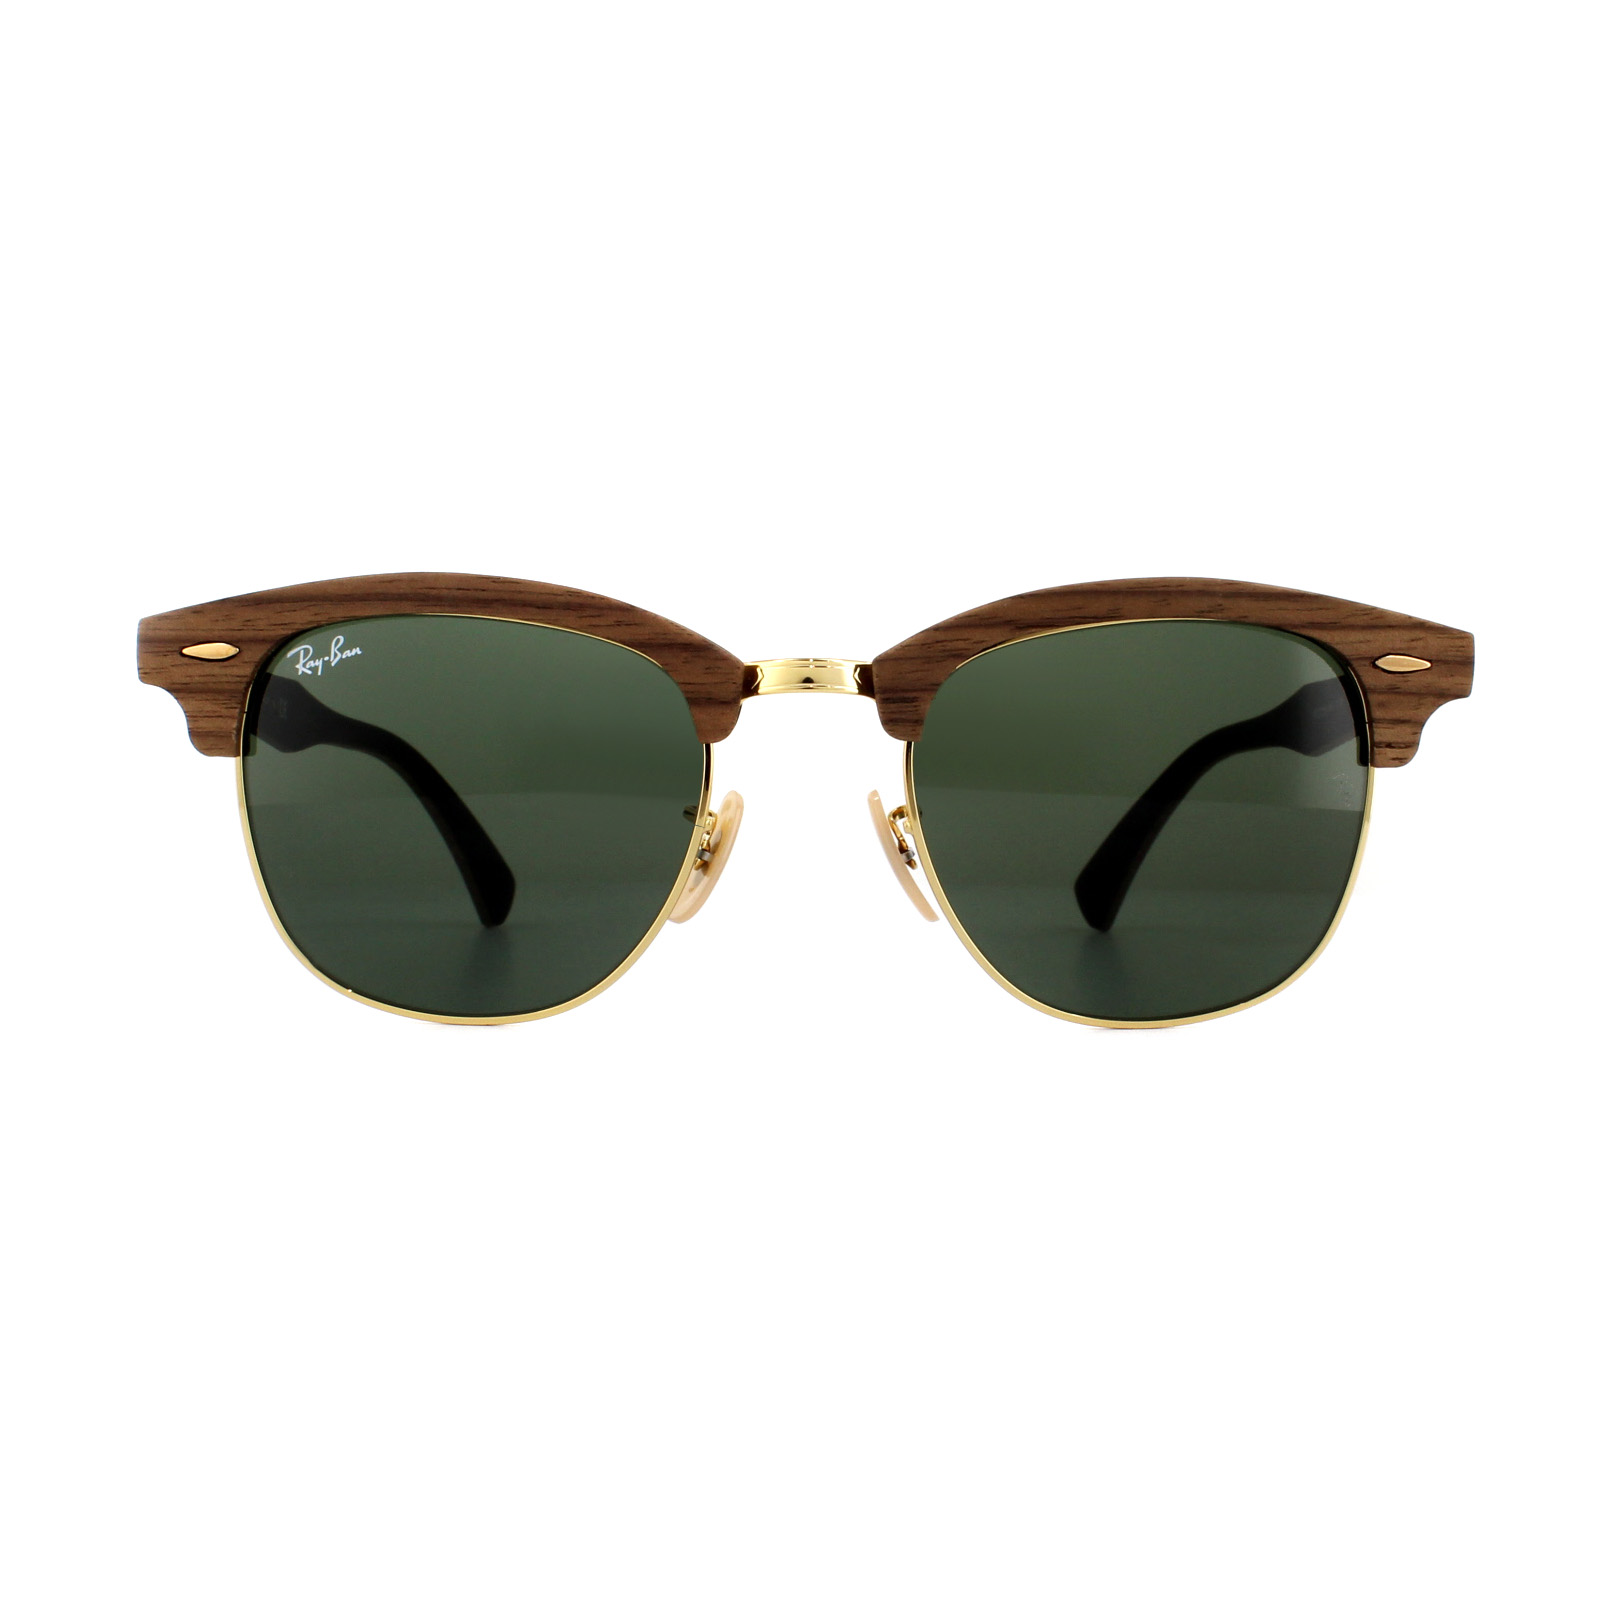 6700ac4be7d49 Sentinel Ray-Ban Sunglasses Clubmaster Wood 3016M 1181 Walnut Green